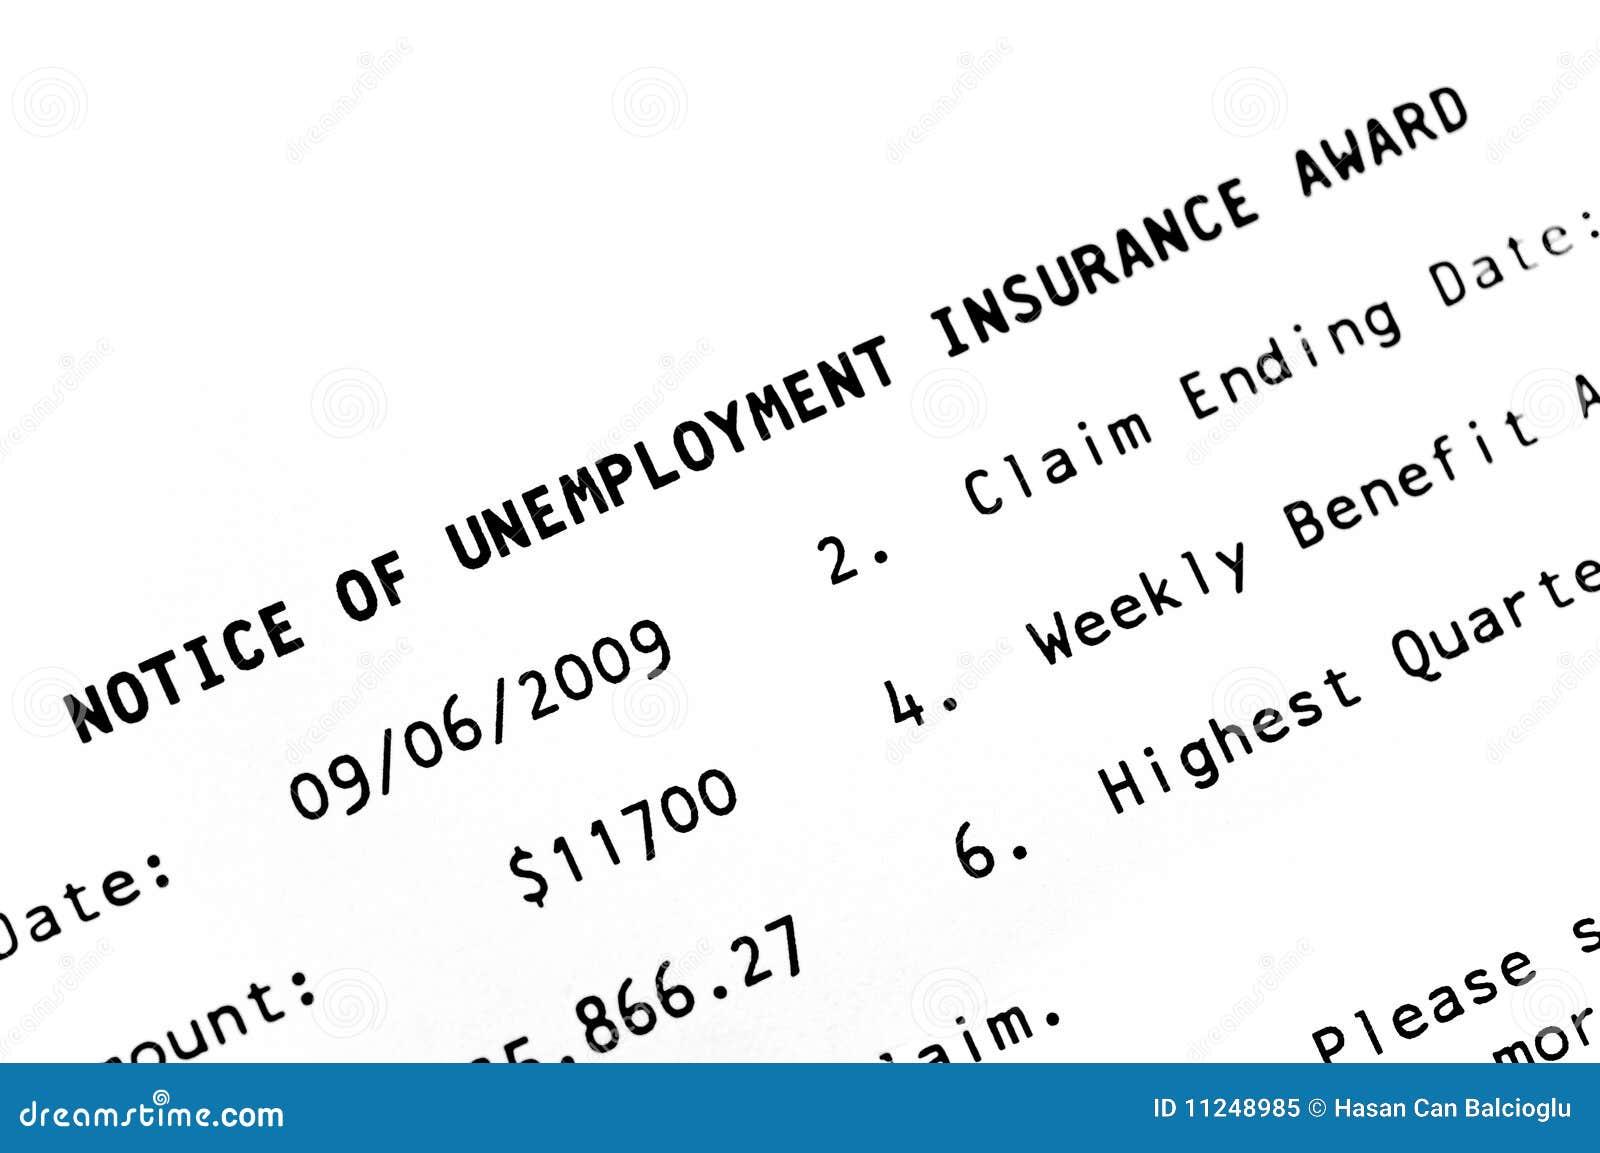 Notice of unemployment award